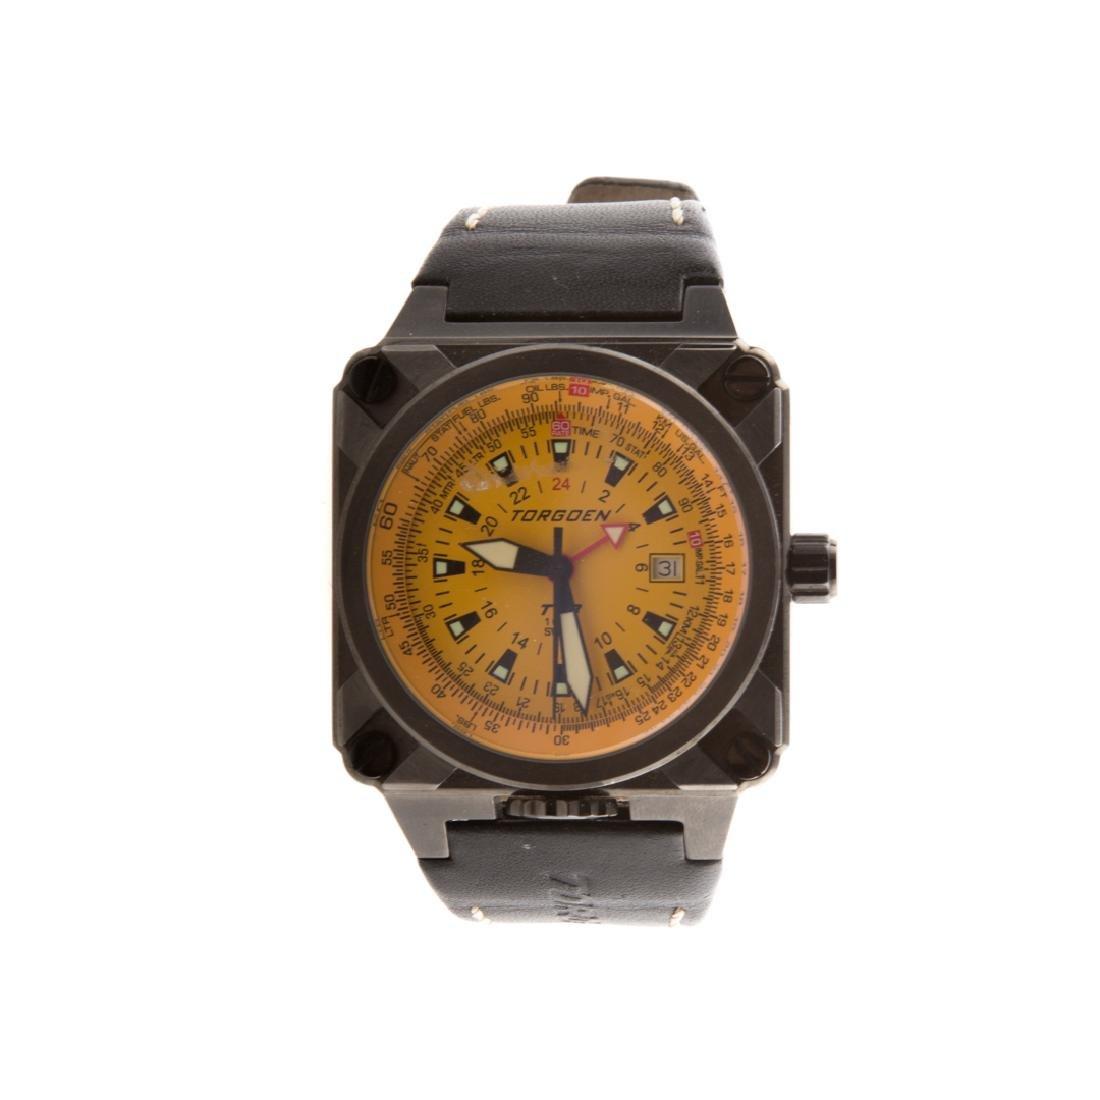 A Gentlemen's Swiss Torgoen Watch